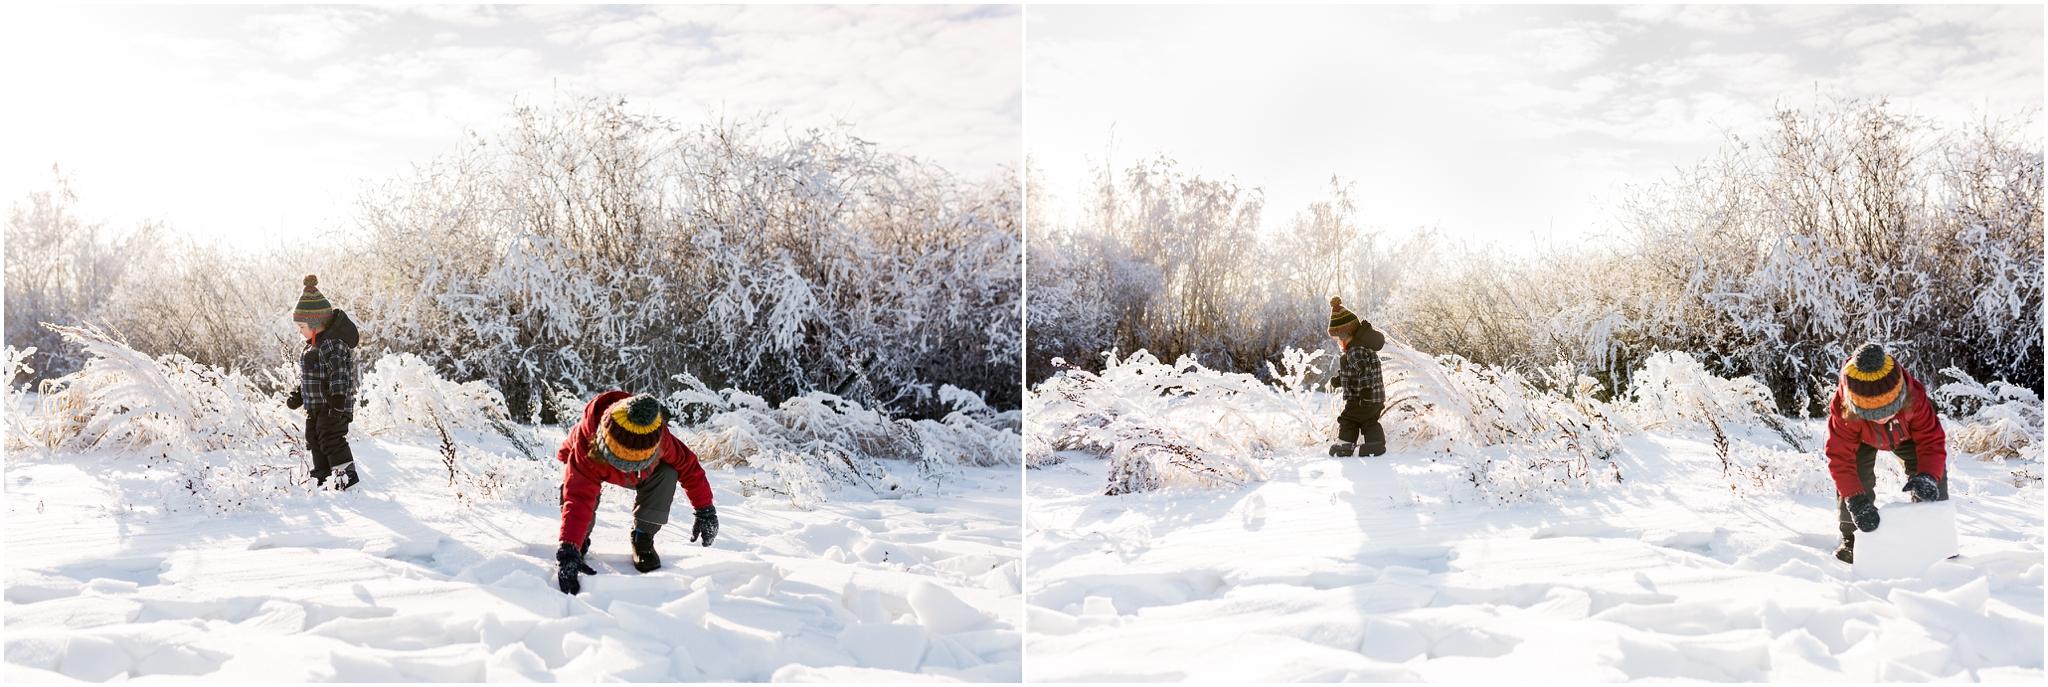 Treelines Photography - Edmonton Lifestyle Photographer - Winter January